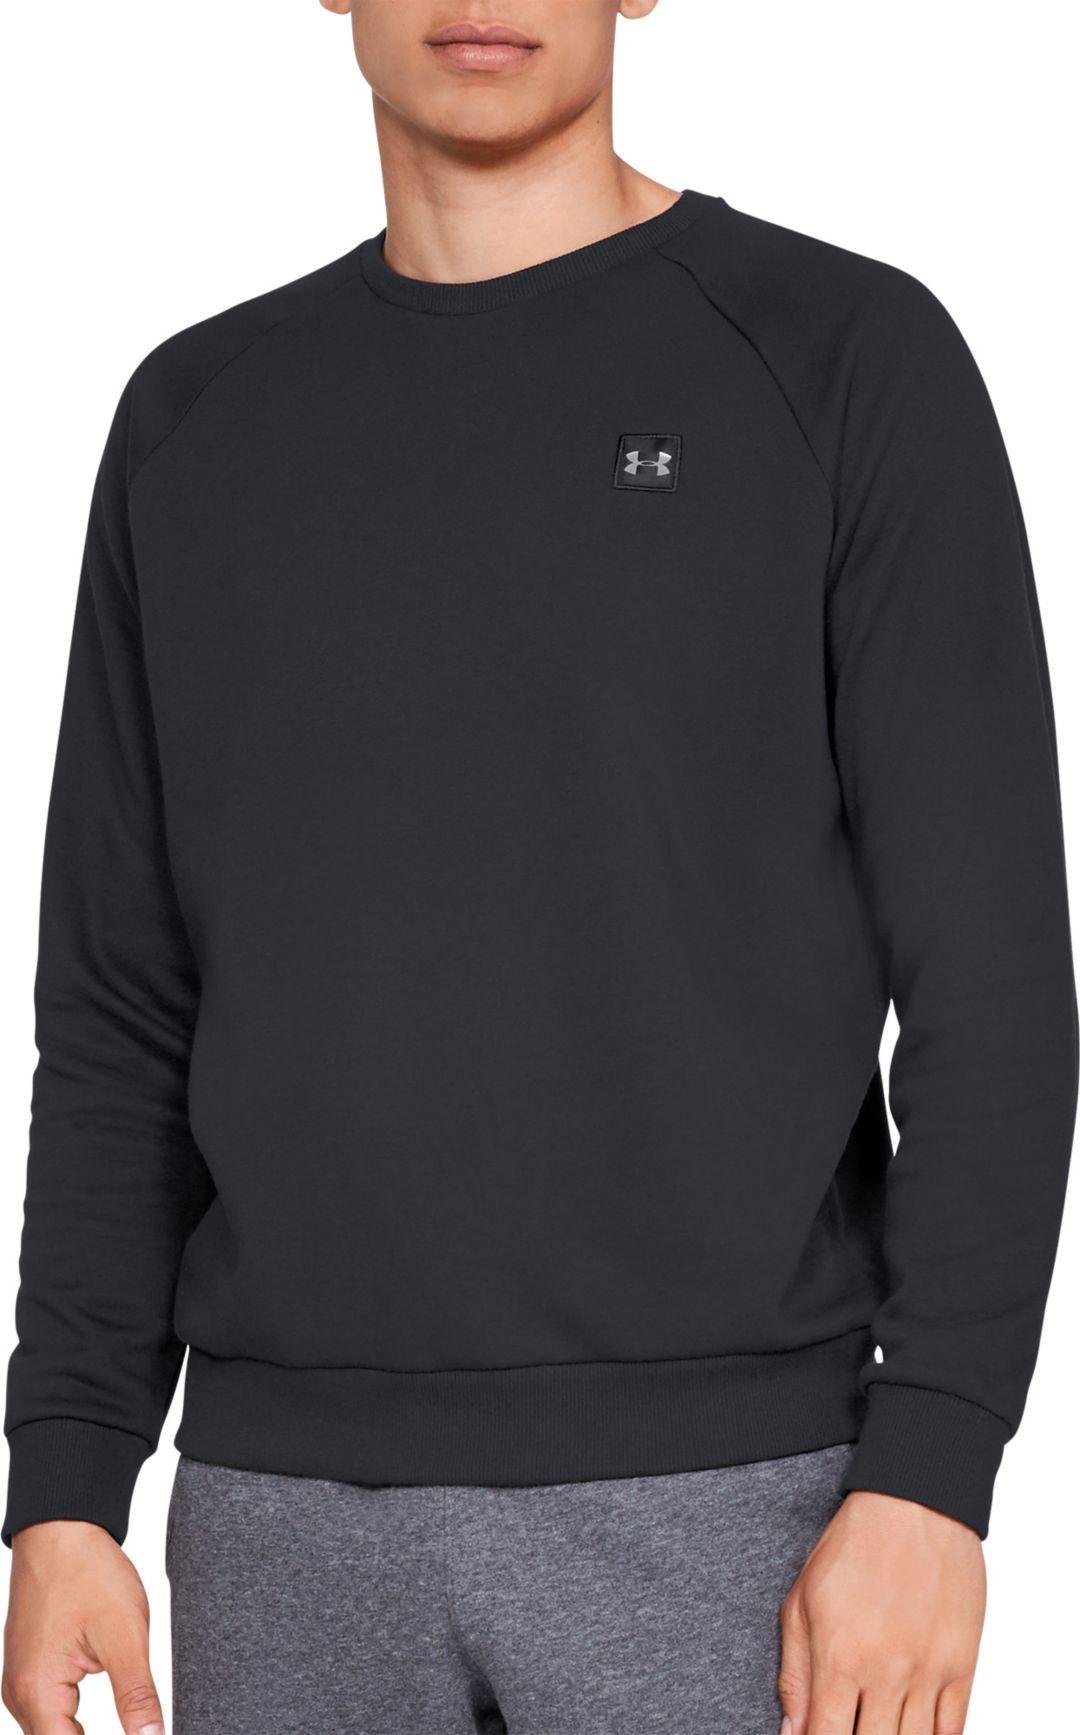 d44fbf05d4 Under Armour Men's Rival Fleece Crewneck Sweatshirt